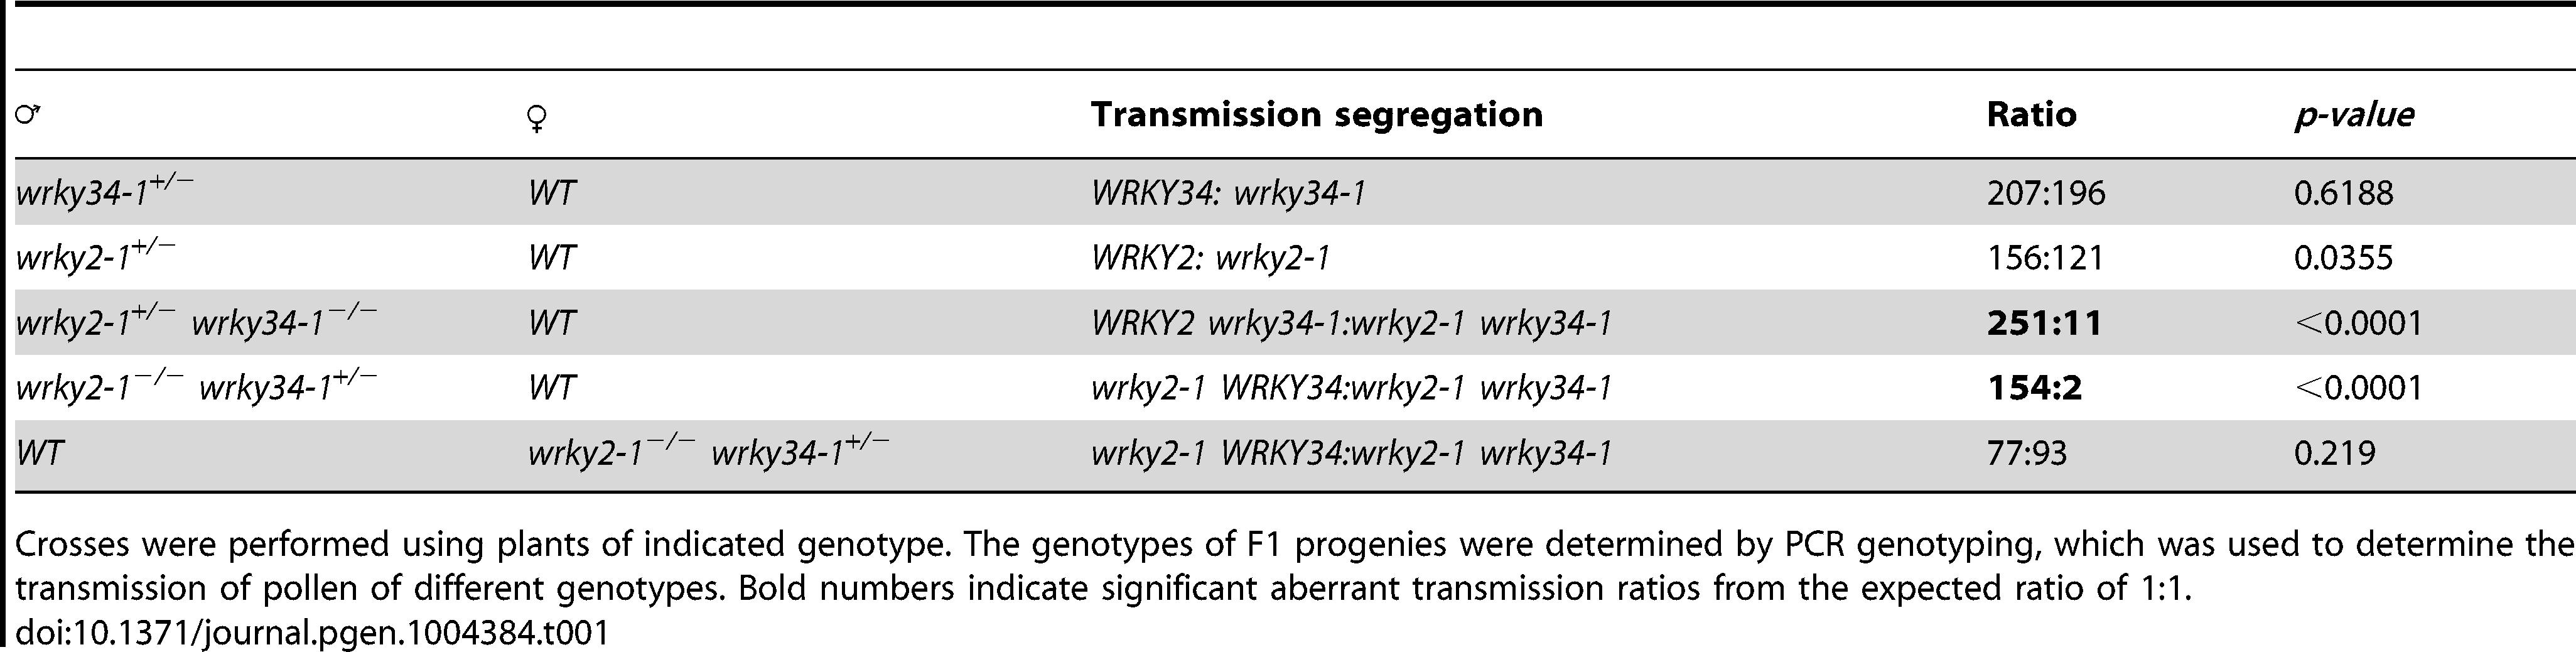 Transmission of <i>wrky2-1</i> and <i>wrky34-1</i> single and double mutant alleles.